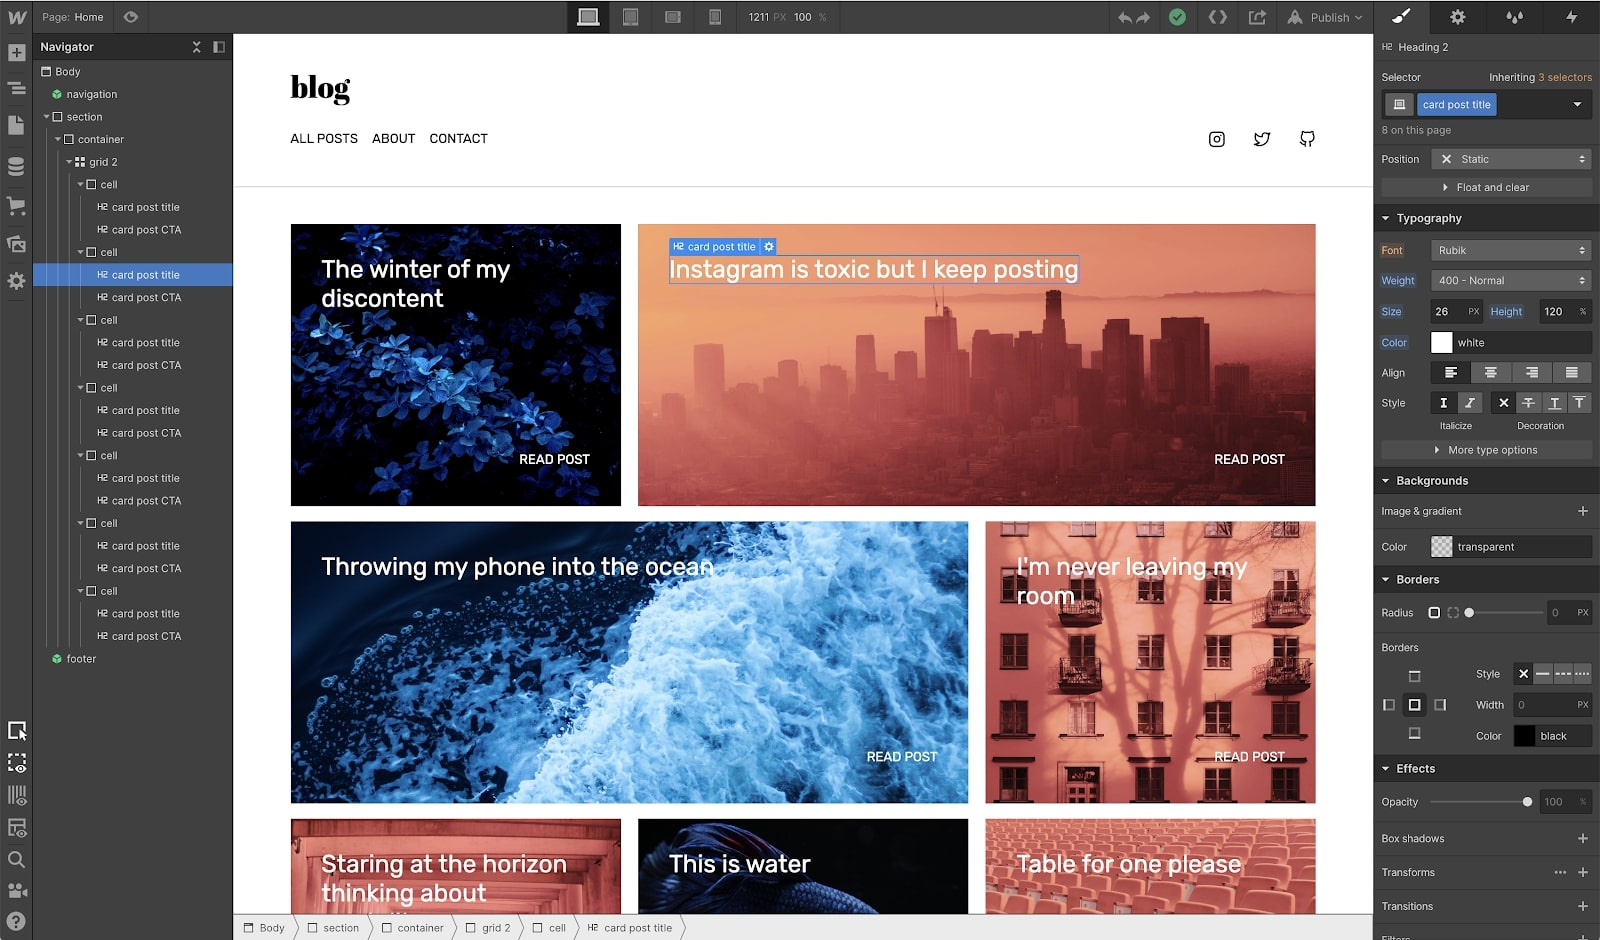 webfow's designer UI